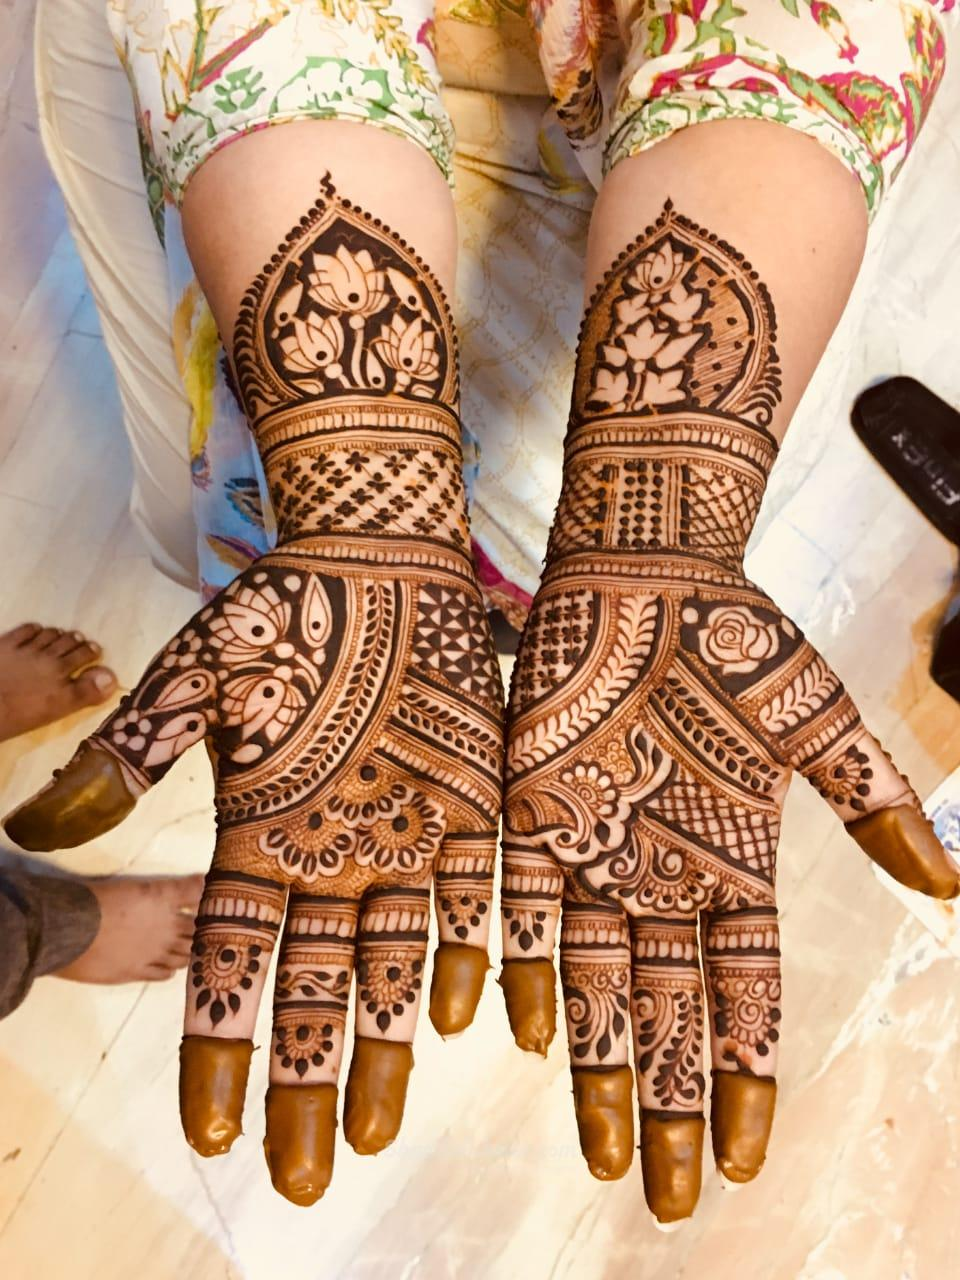 Anil Mehandi Artist